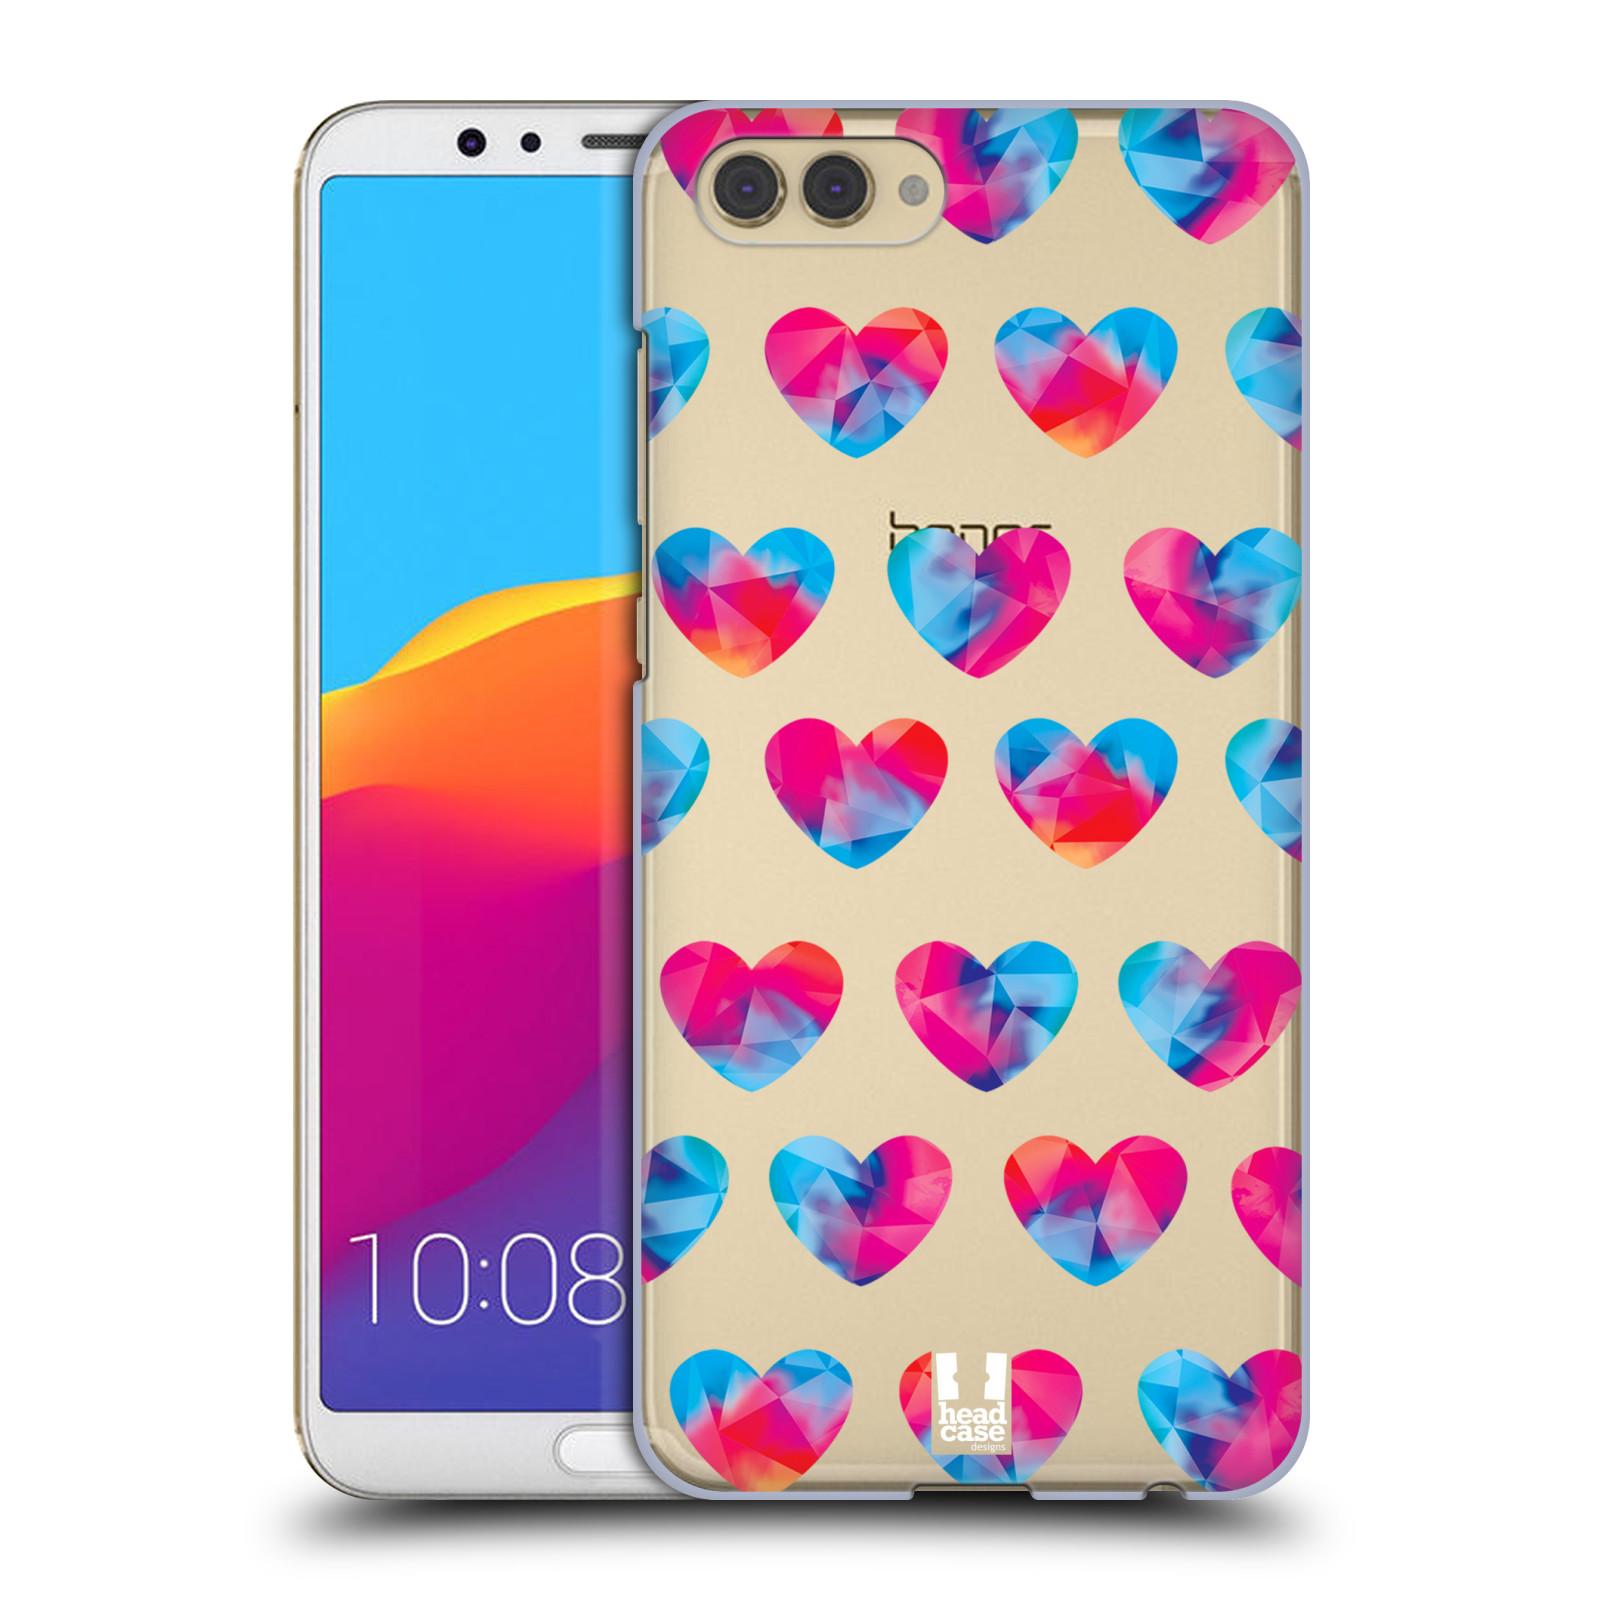 Plastové pouzdro na mobil Honor View 10 - Head Case - Srdíčka hrající barvami